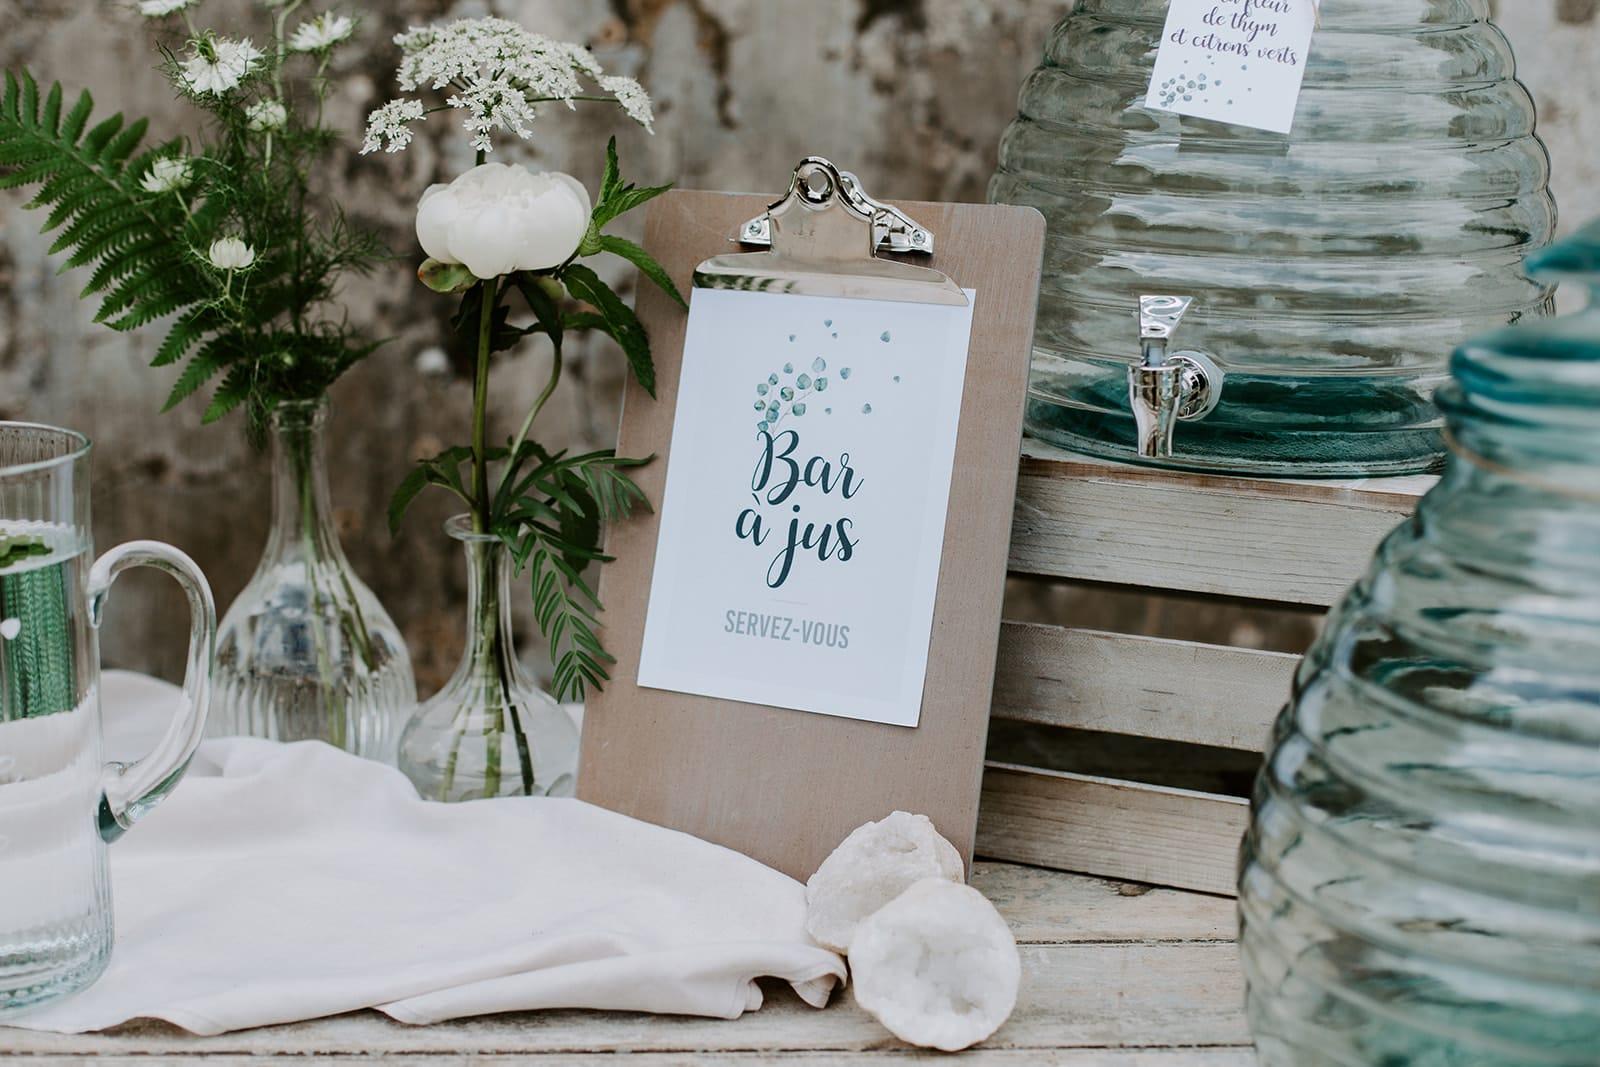 mariage_chateau_la_flocelliere_vendee_flavie_nelly_photographe-101-obonheurdesdames-decoration-mariage-location-vegetal